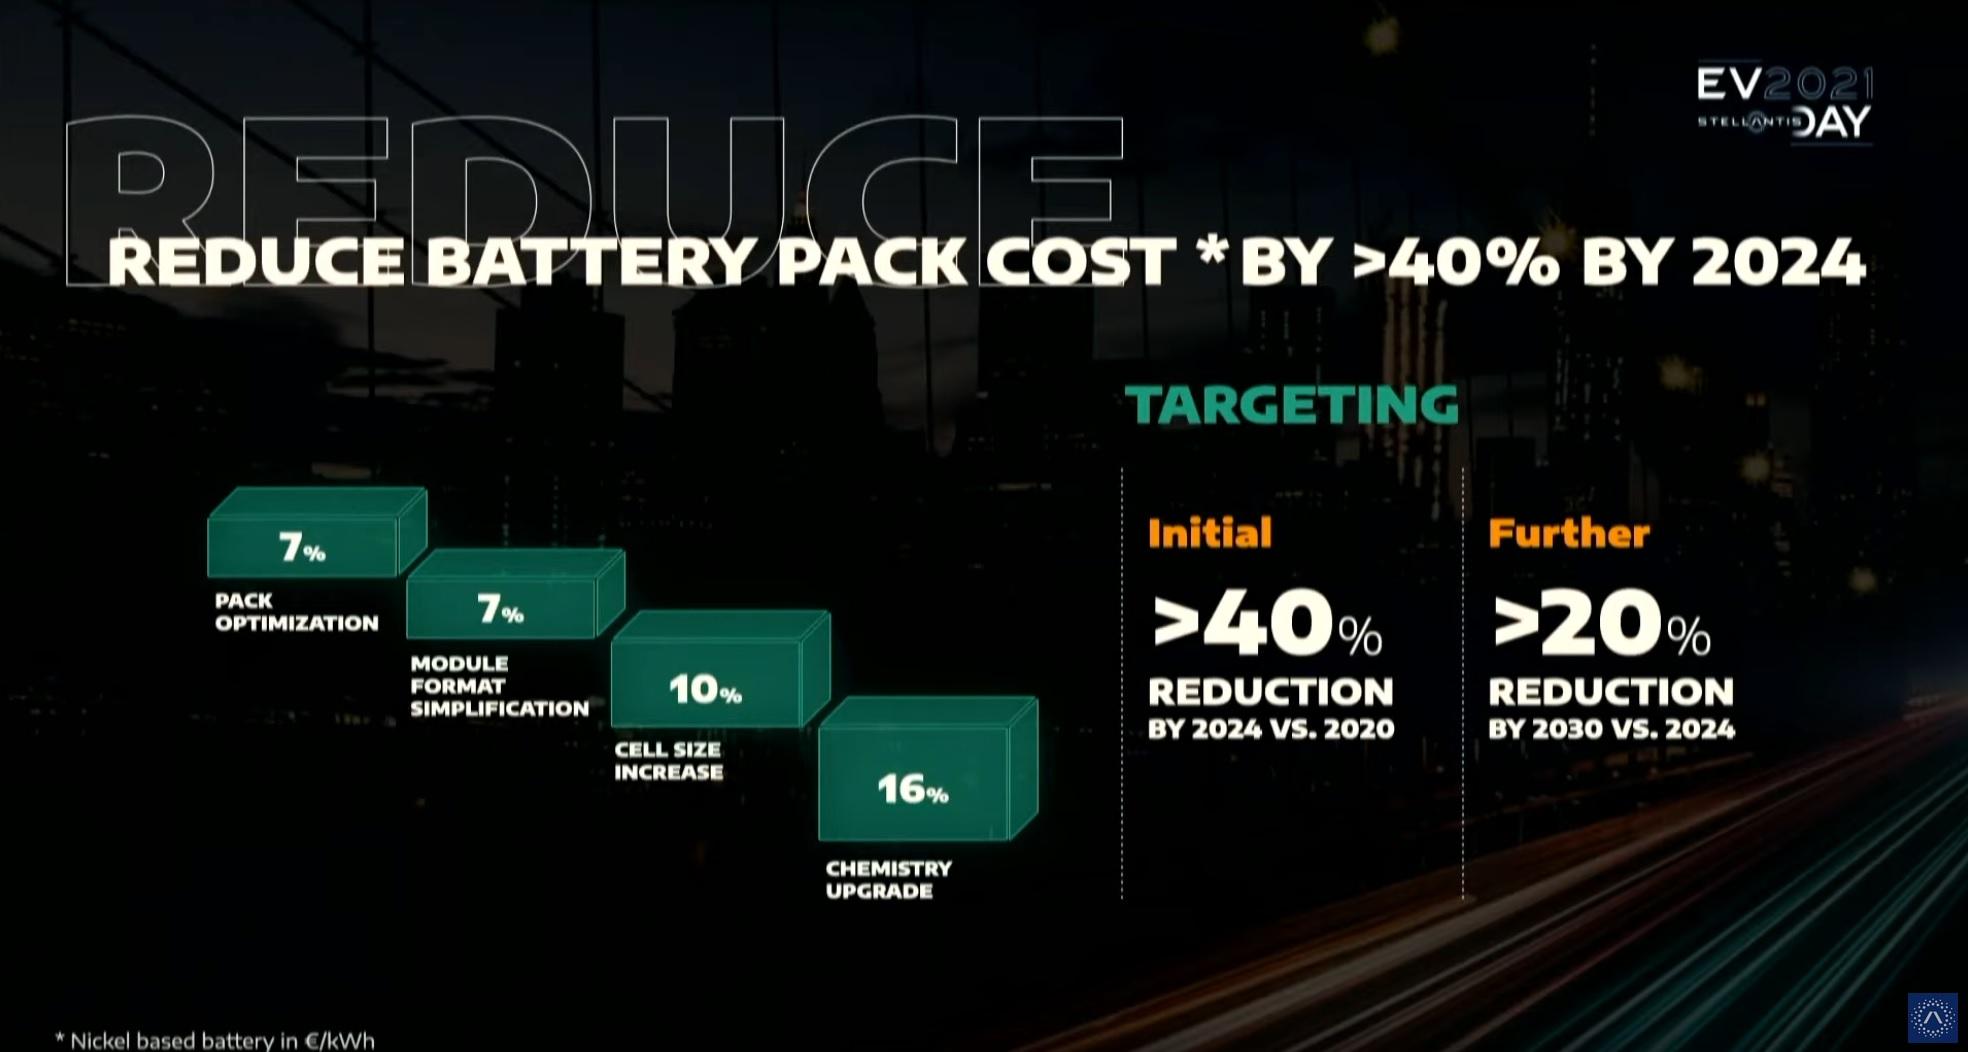 stellantis-battery-info-20210708-b.jpeg